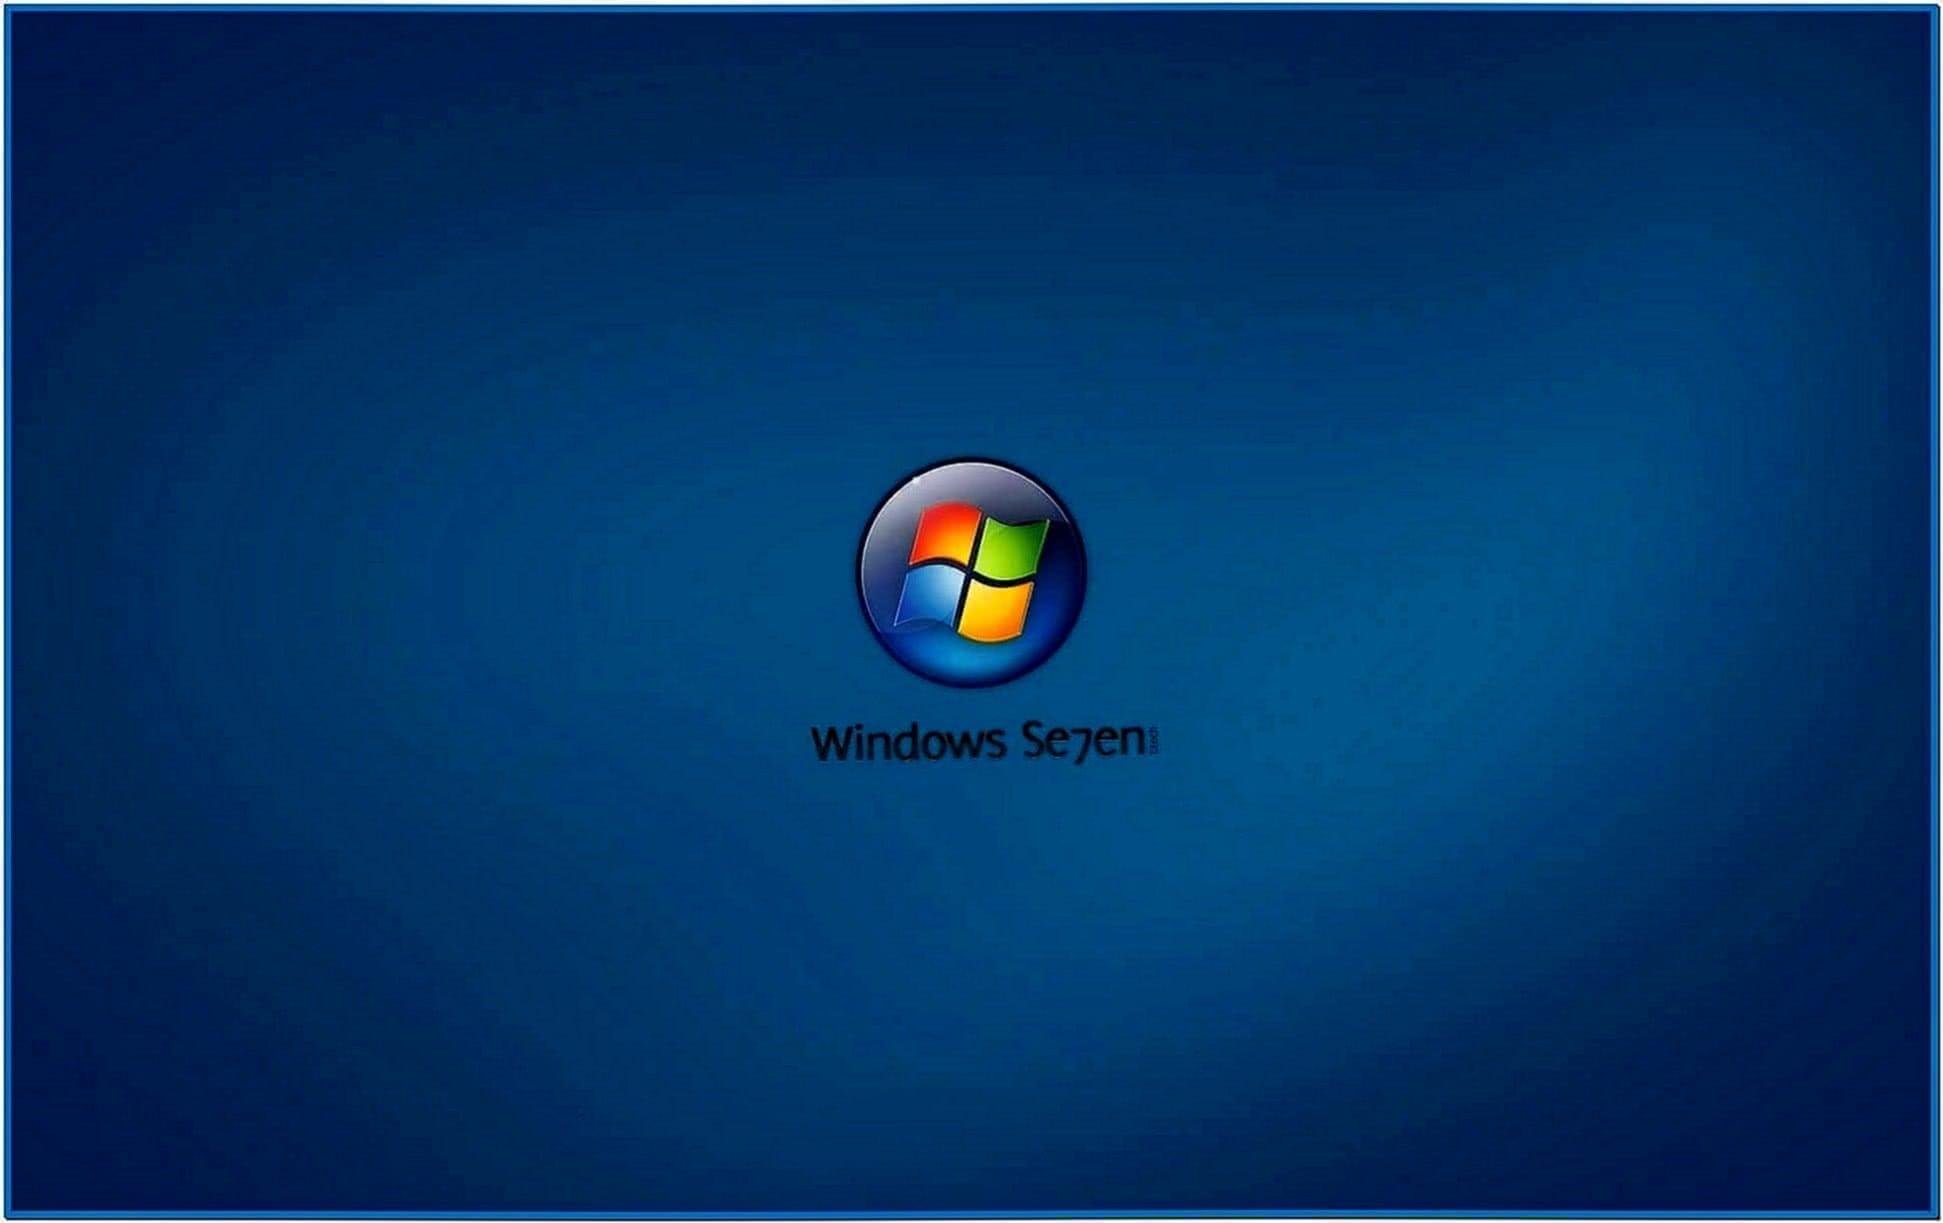 Windows Vista Photo Gallery Screensaver